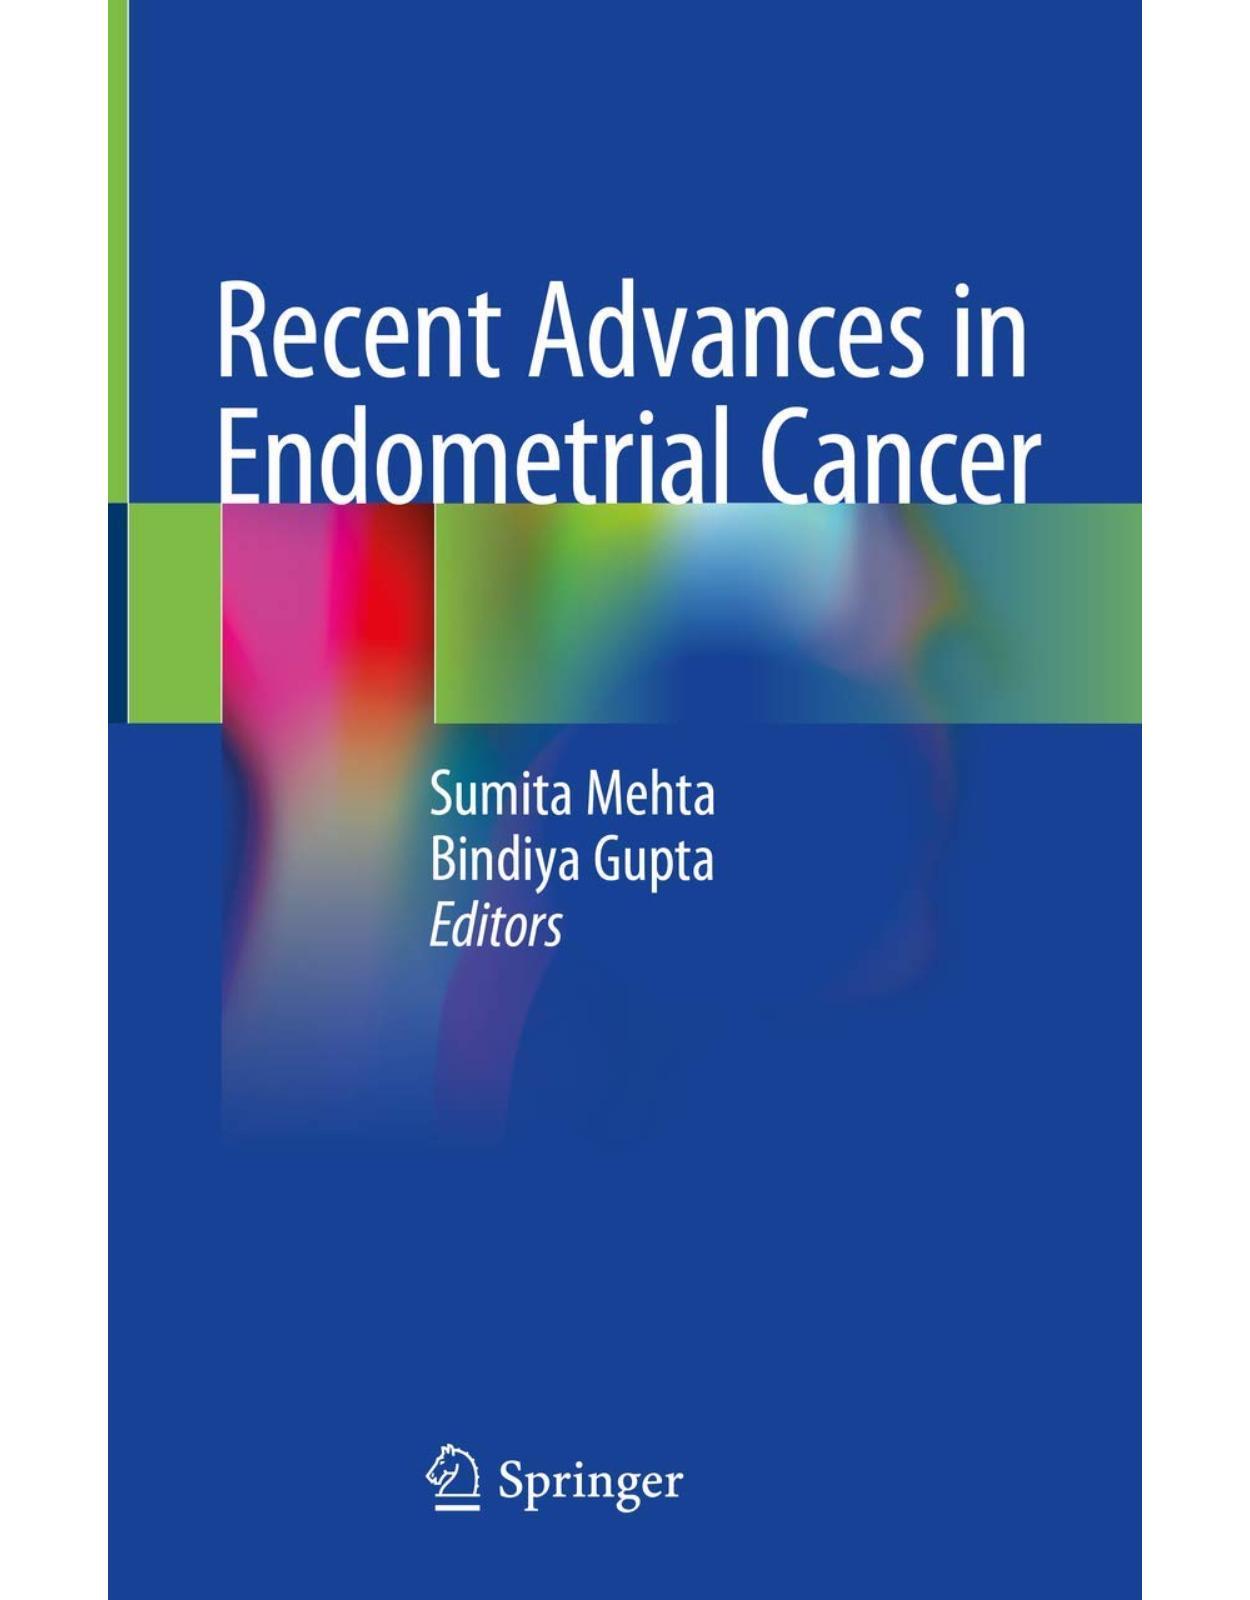 Recent Advances in Endometrial Cancer